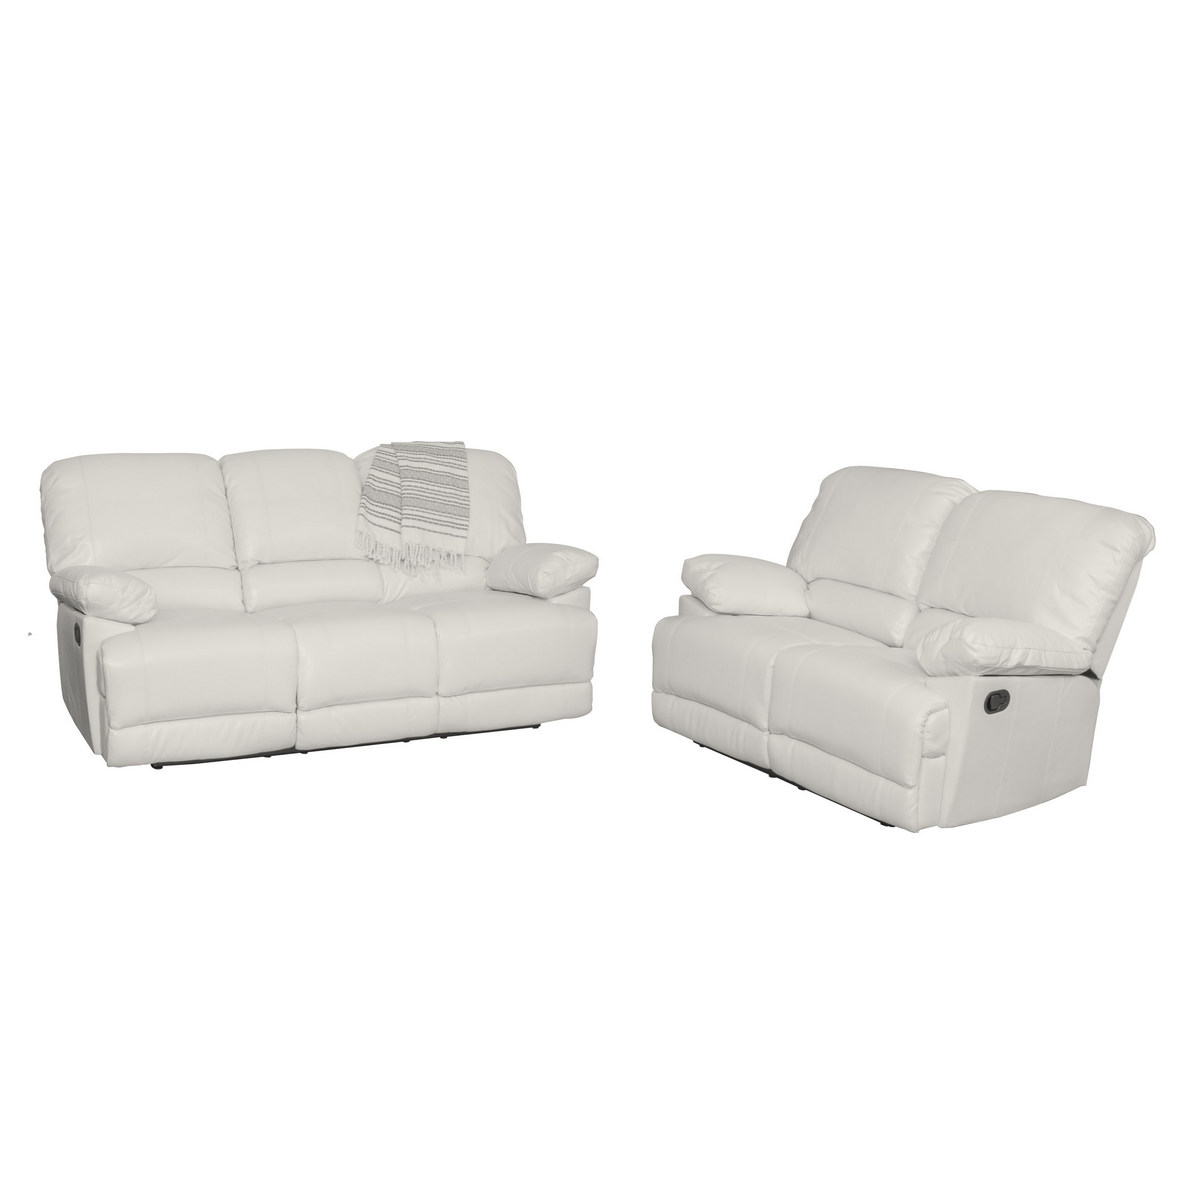 Corliving Furniture